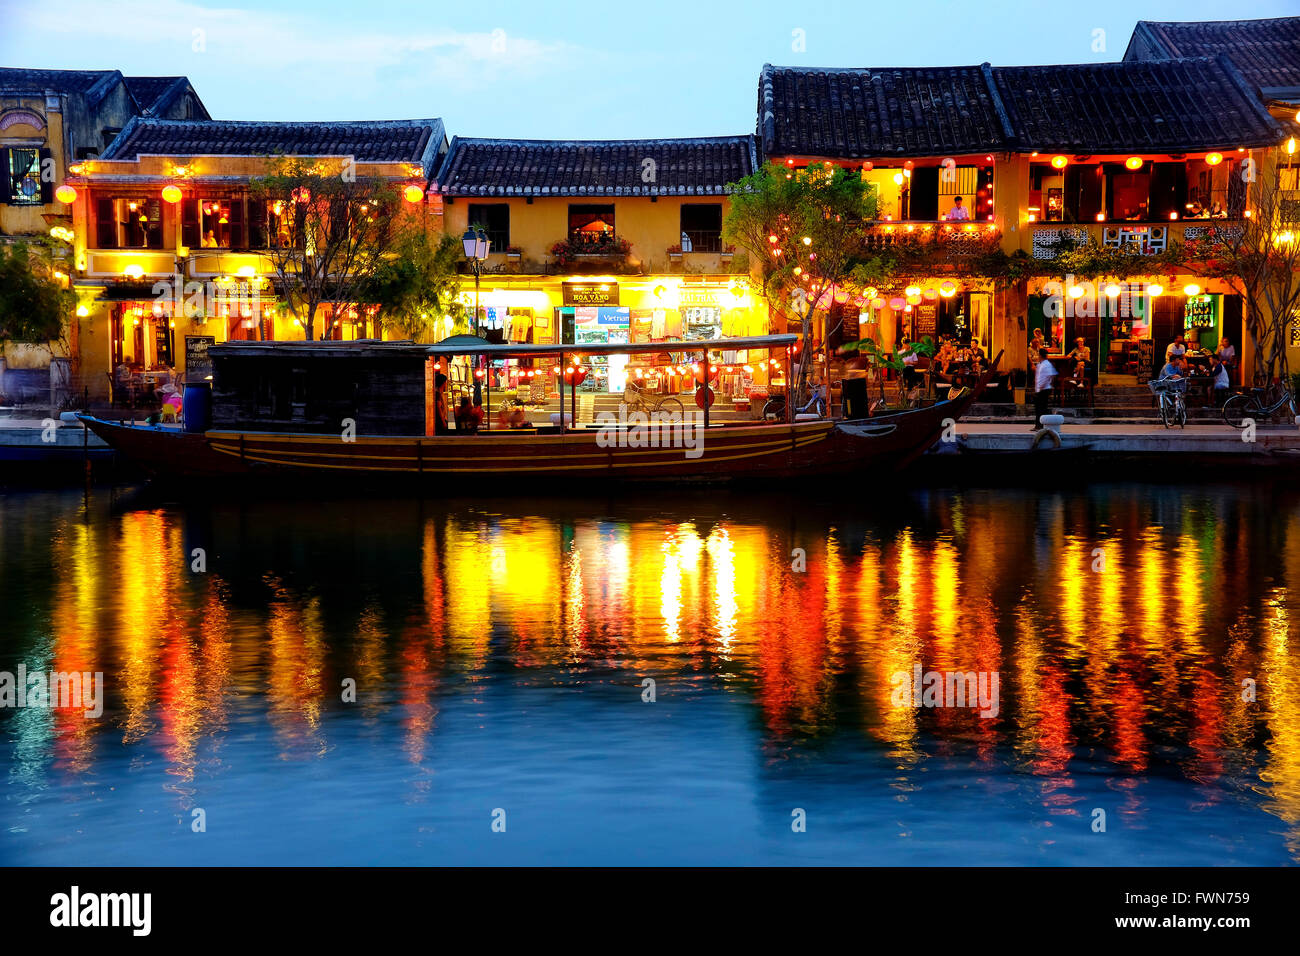 Hoi An riverfront, Hoi An, Vietnam - Stock Image